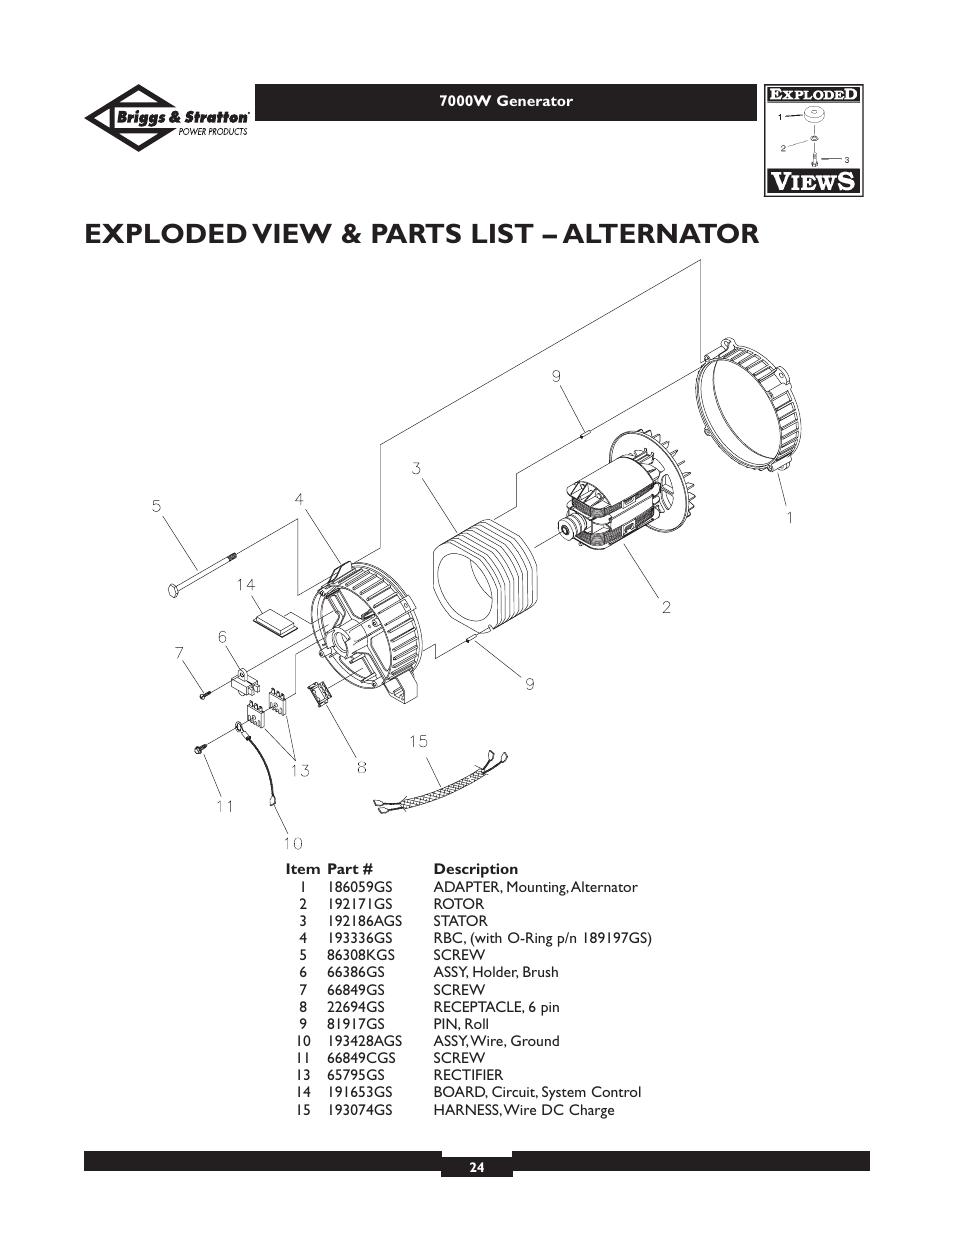 exploded view parts list alternator briggs stratton elite rh manualsdir com